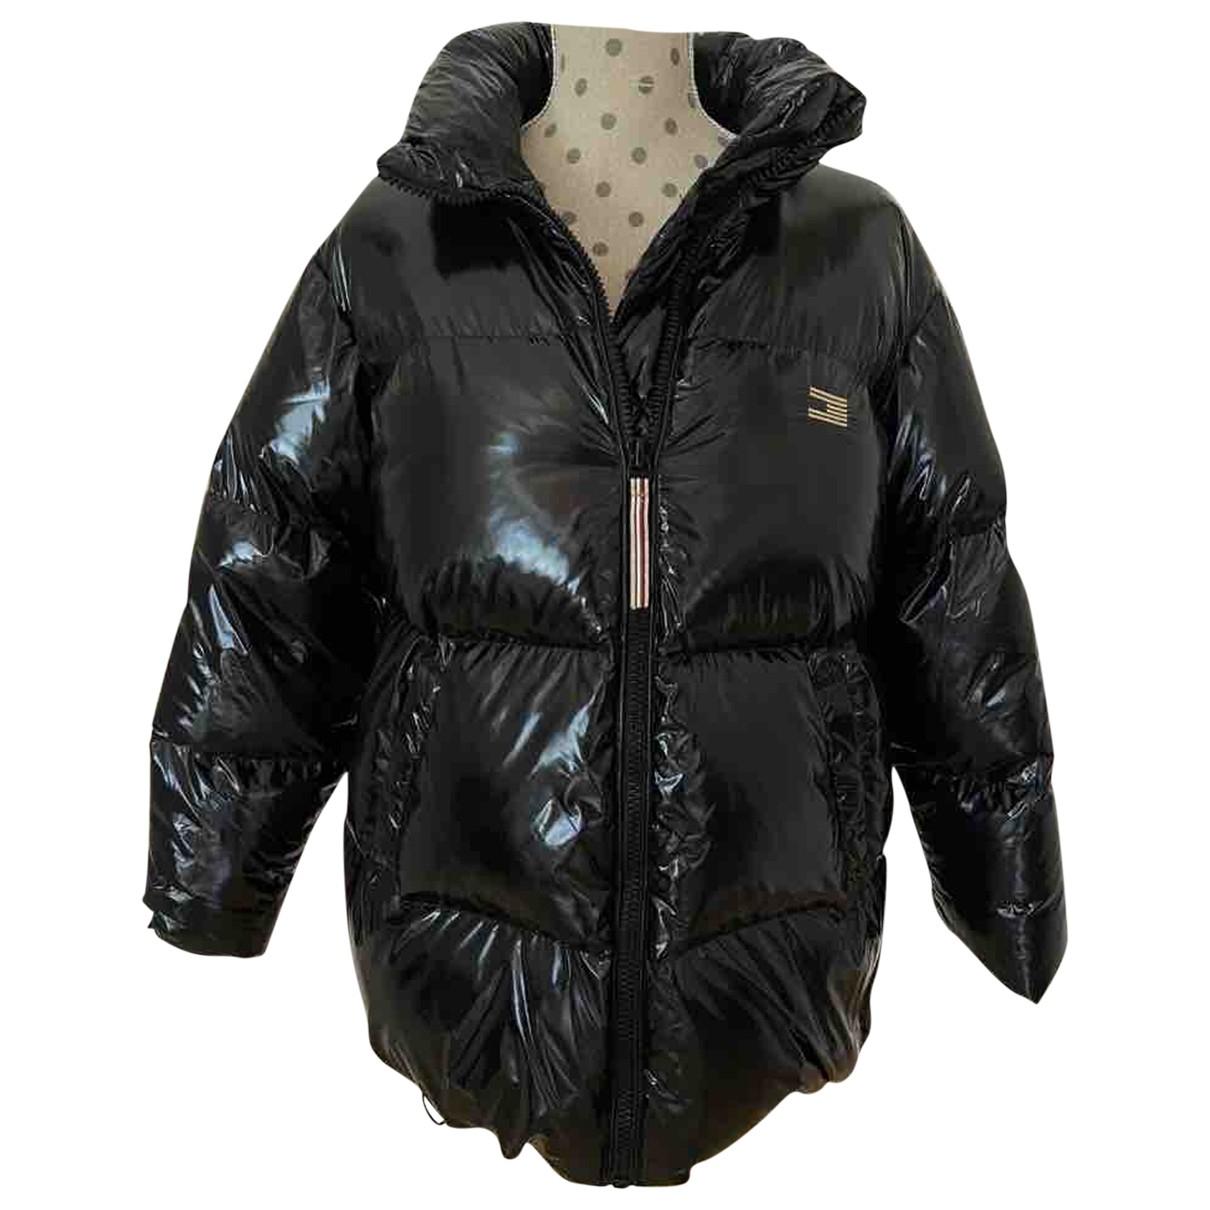 Tommy Hilfiger \N Black coat for Women M International